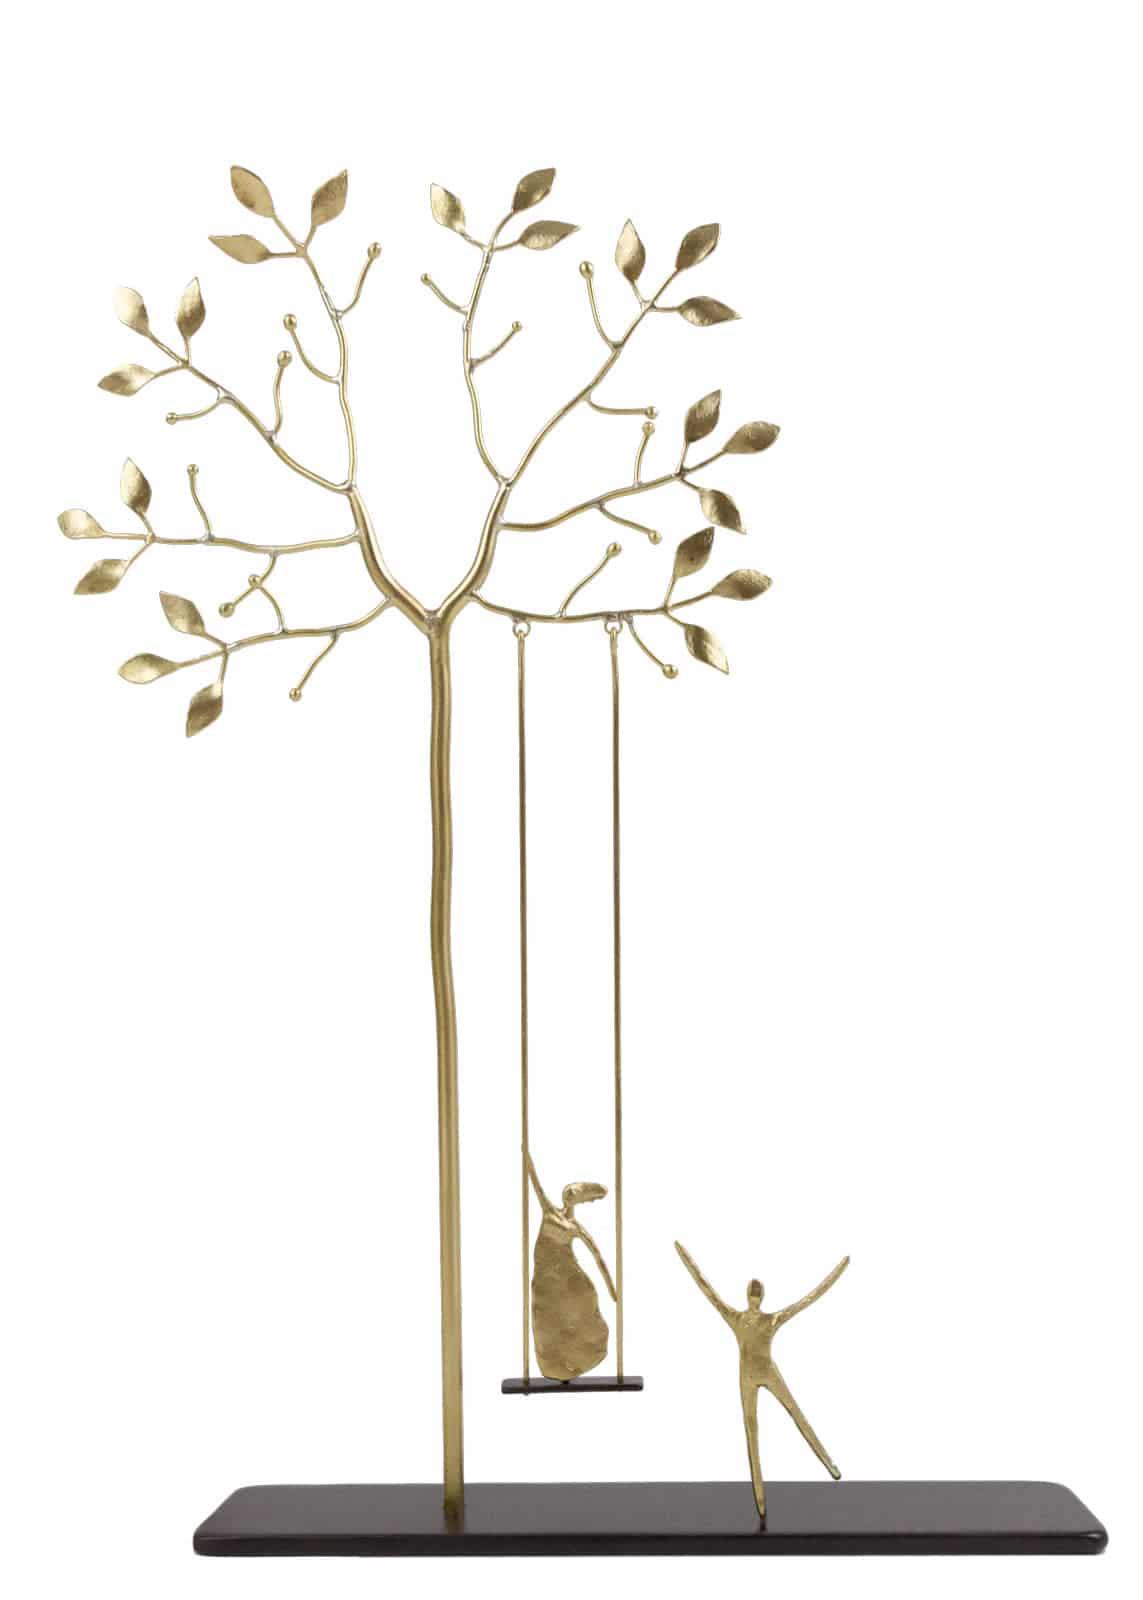 Swinging, Anna Andreadi